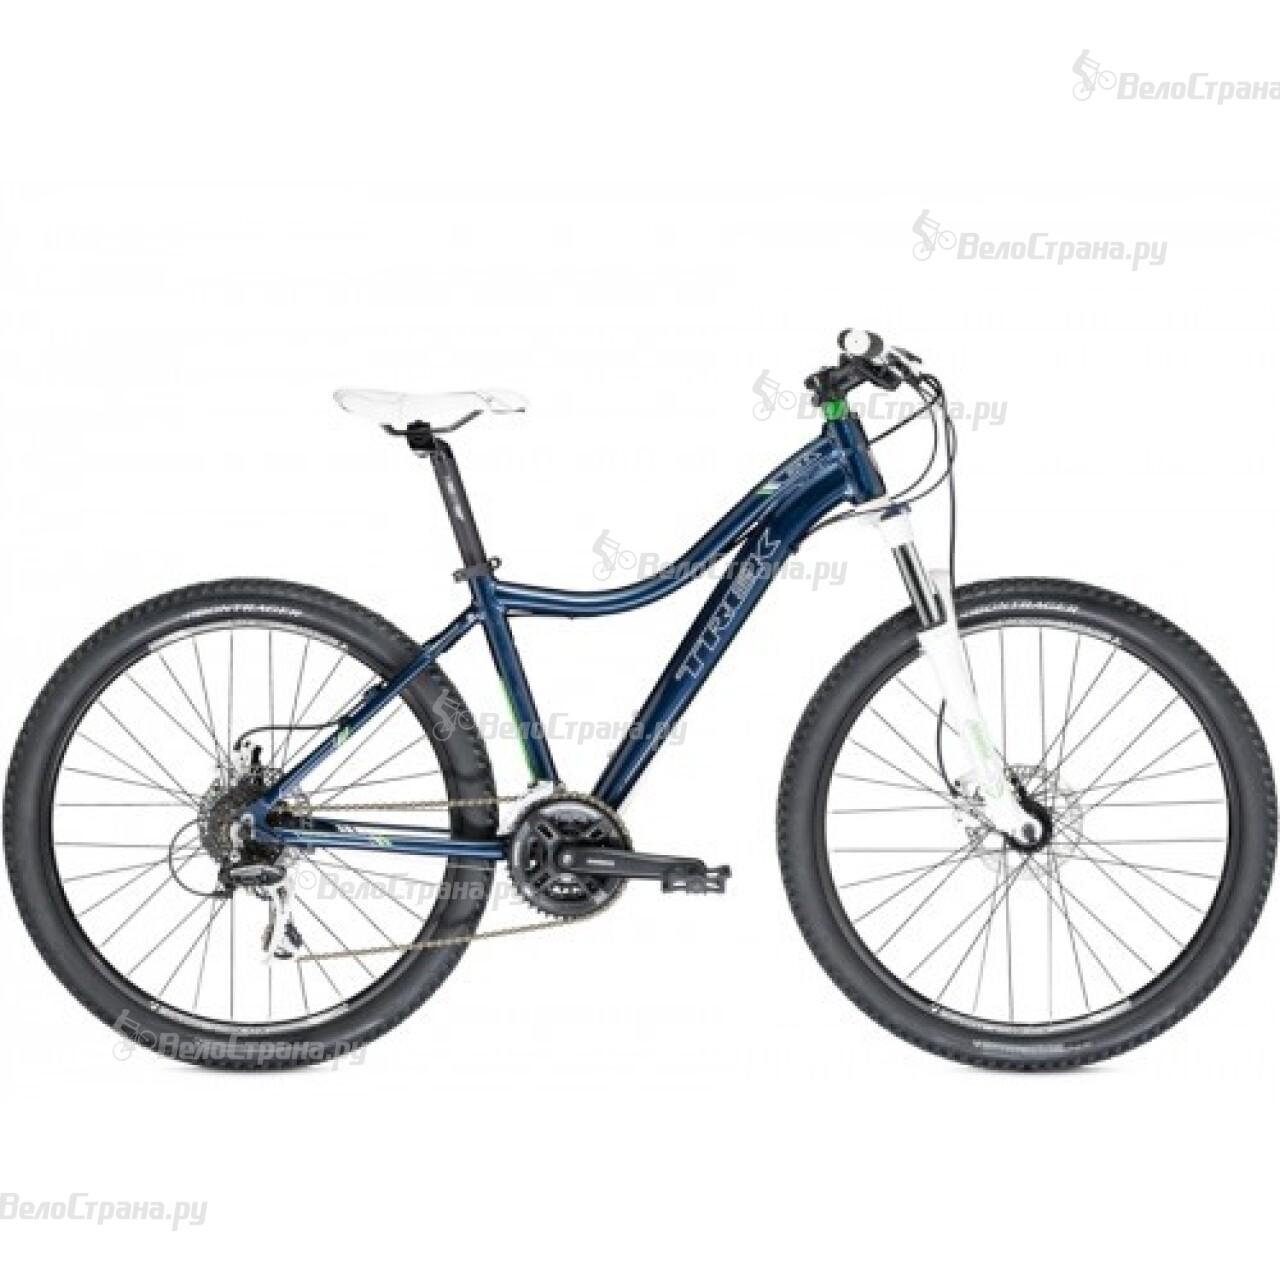 все цены на Велосипед Trek Skye SL Disc (2014) онлайн